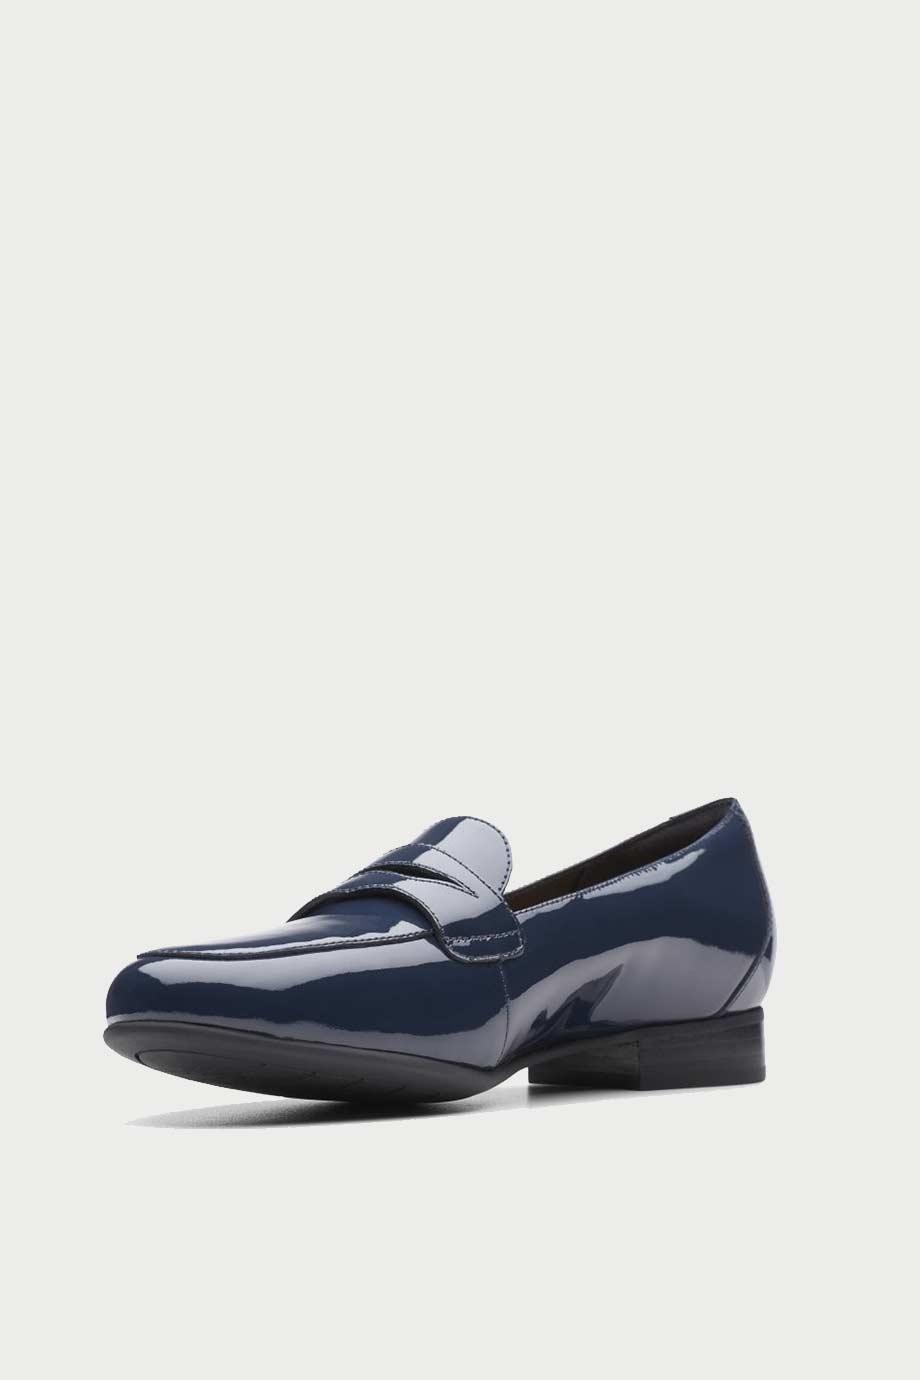 spiridoula metheniti shoes xalkida p un blush go clarks navy patent 4 1